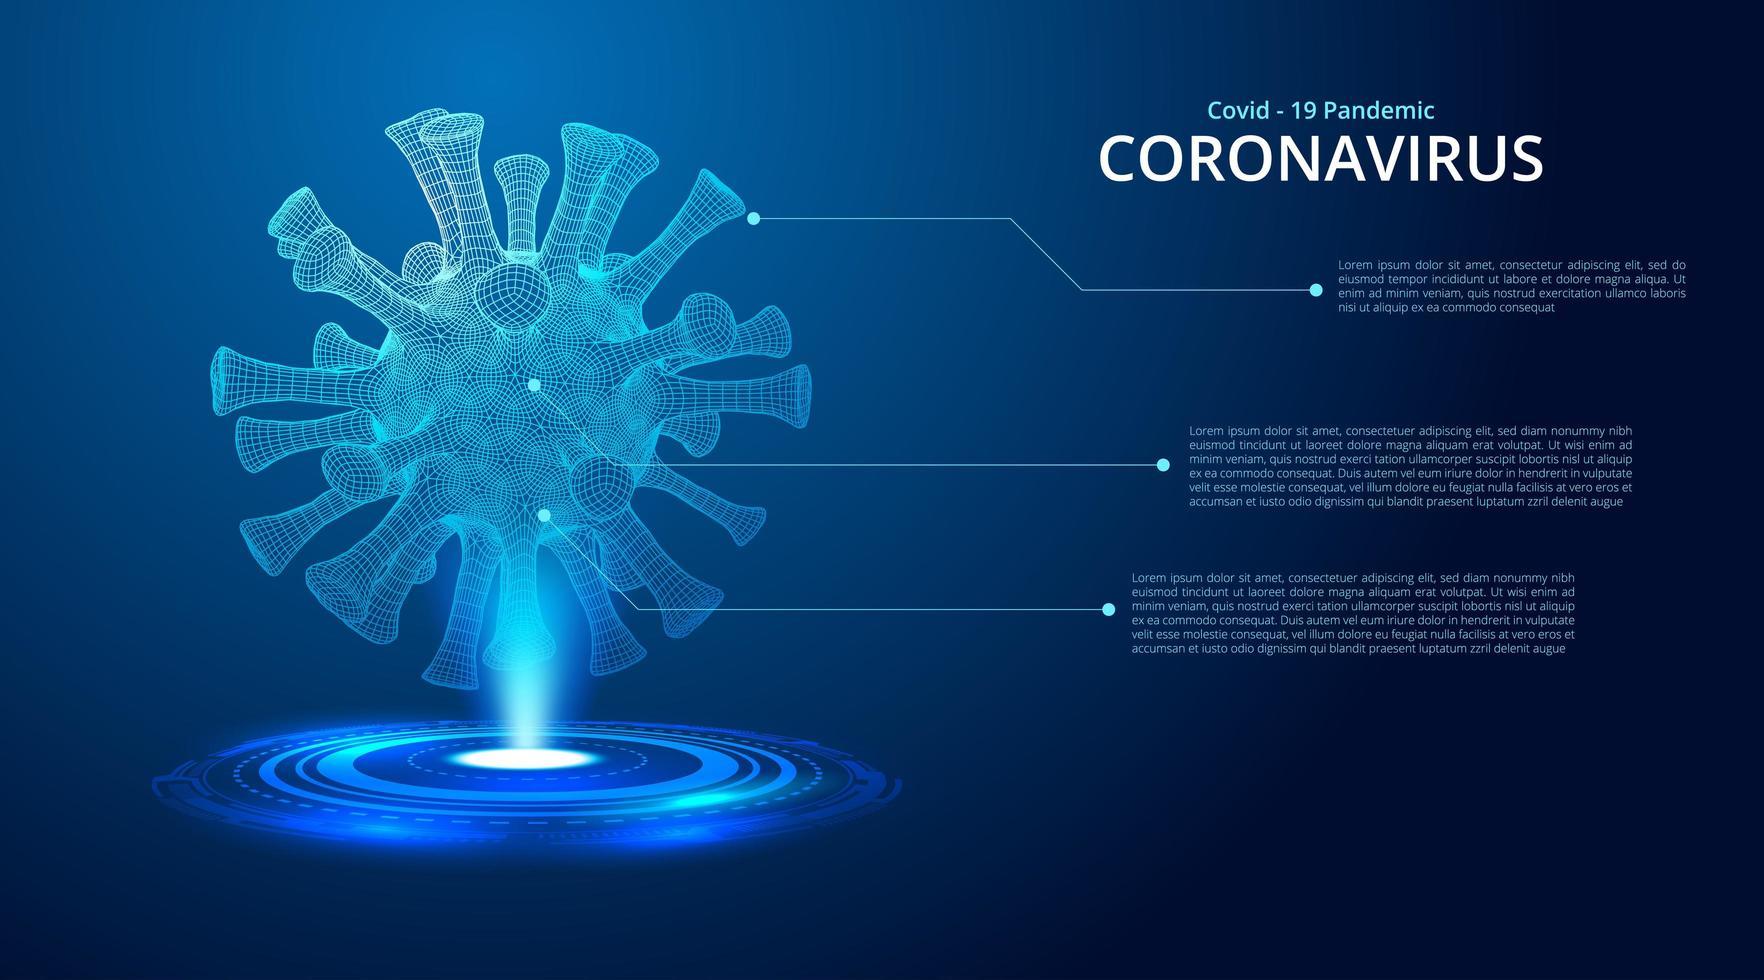 Dark Blue Shining 2019-nCov Coronavirus Low Poly vector